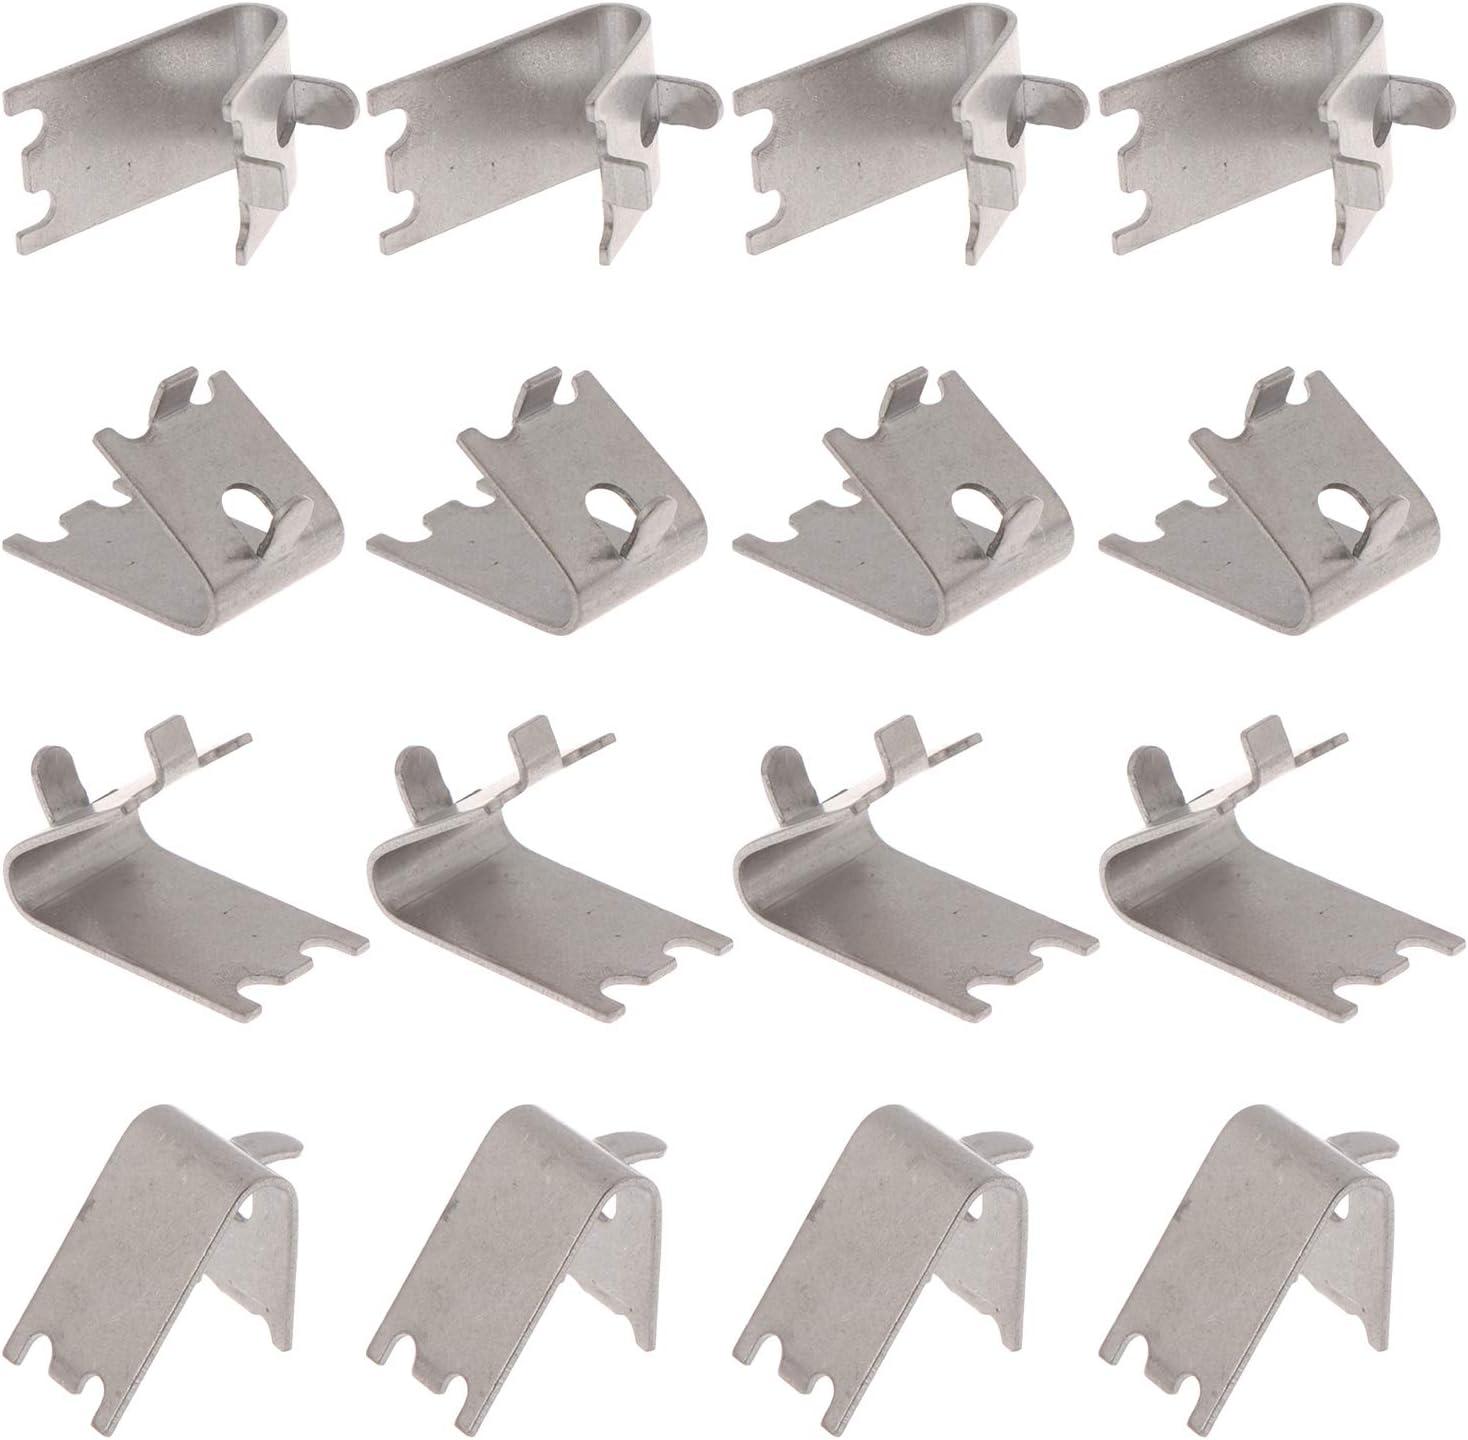 LOCOLO 16 Pieces Freezer Shelf Clip Fridge Cooler Shelf Clips Stainless Steel Shelf Support Clips for Refrigerator Shelf